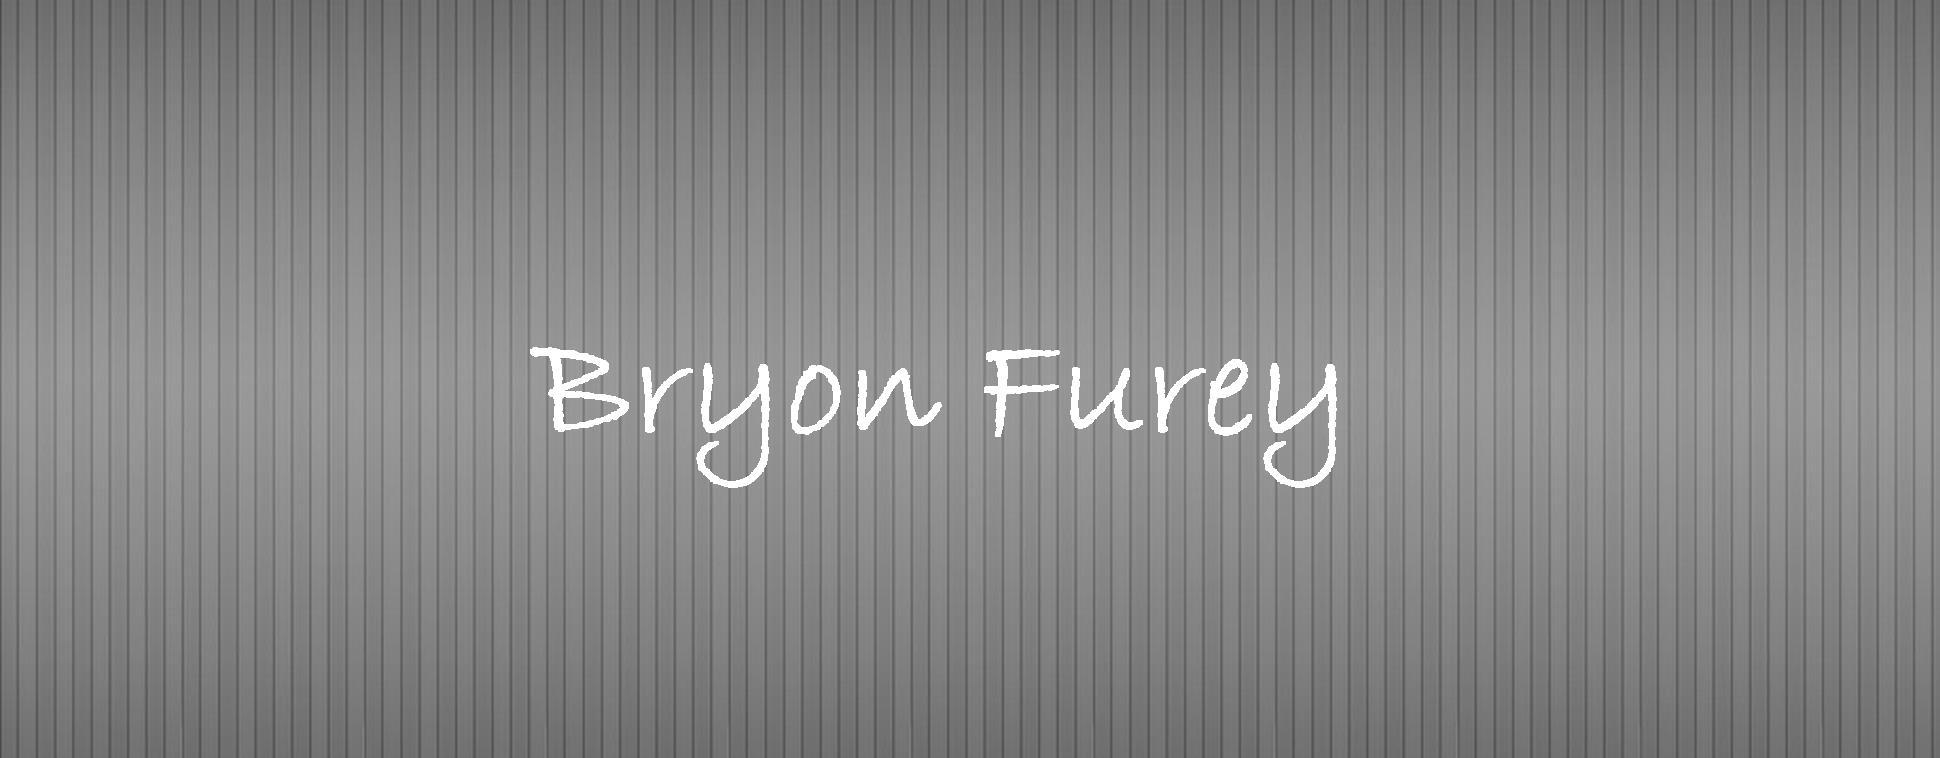 Bryon Furey.jpg